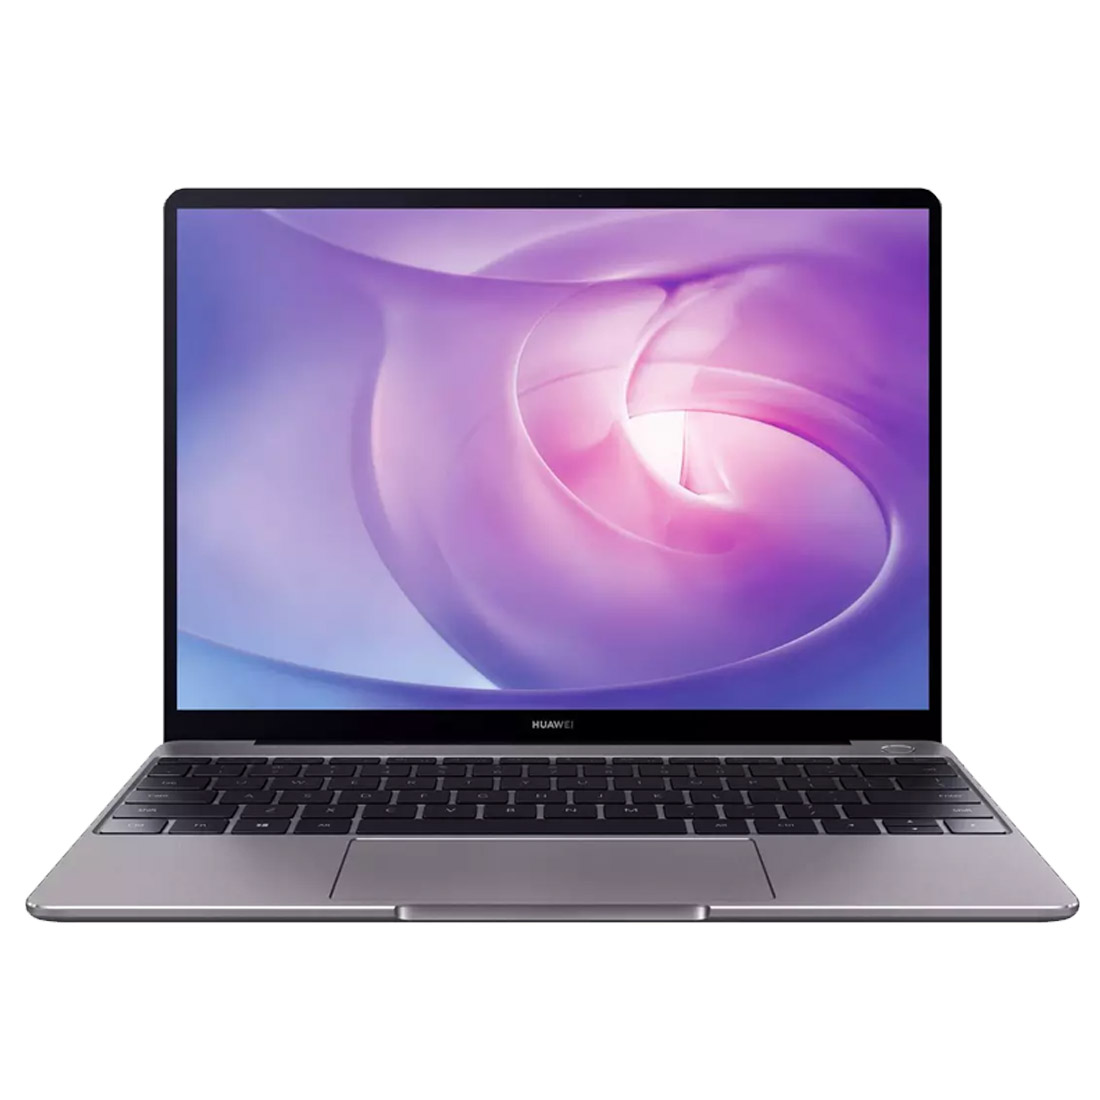 "Huawei Matebook 13 2020 (13"" Touch, i7-10510U, MX250, 16GB/512GB SSD) - Space Grey"